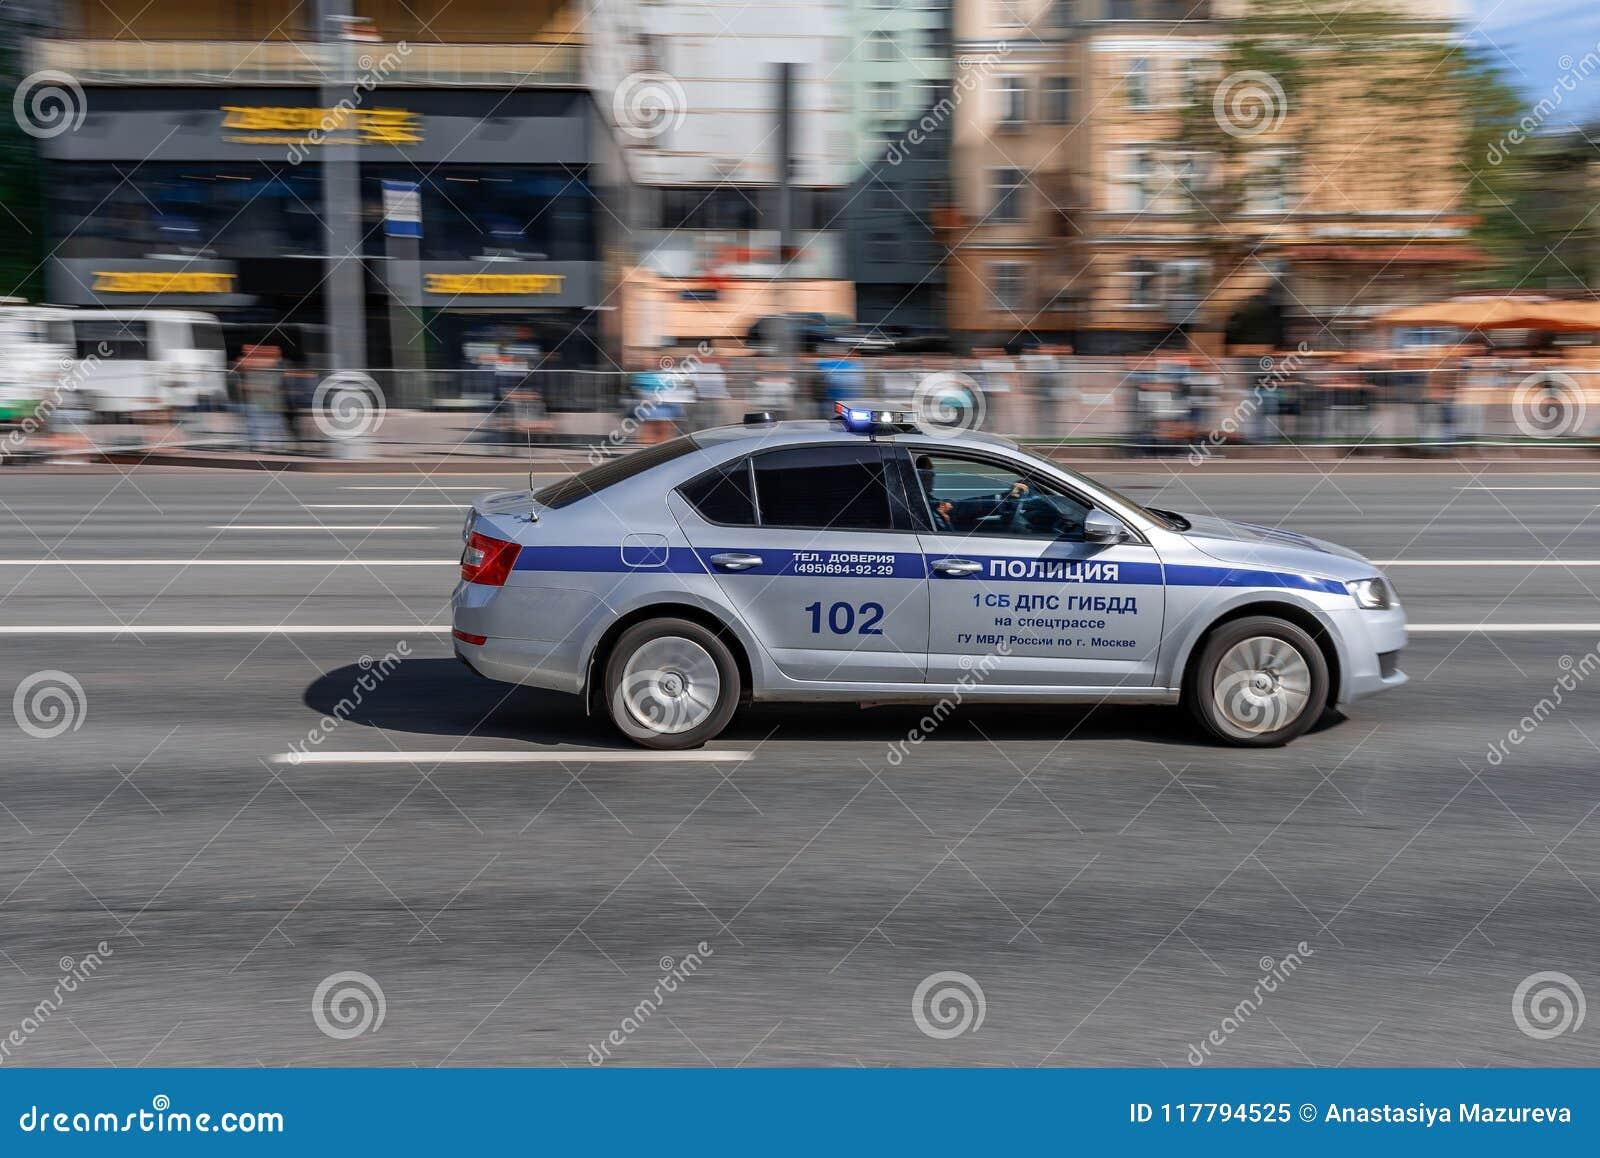 Coche policía Coche oficial